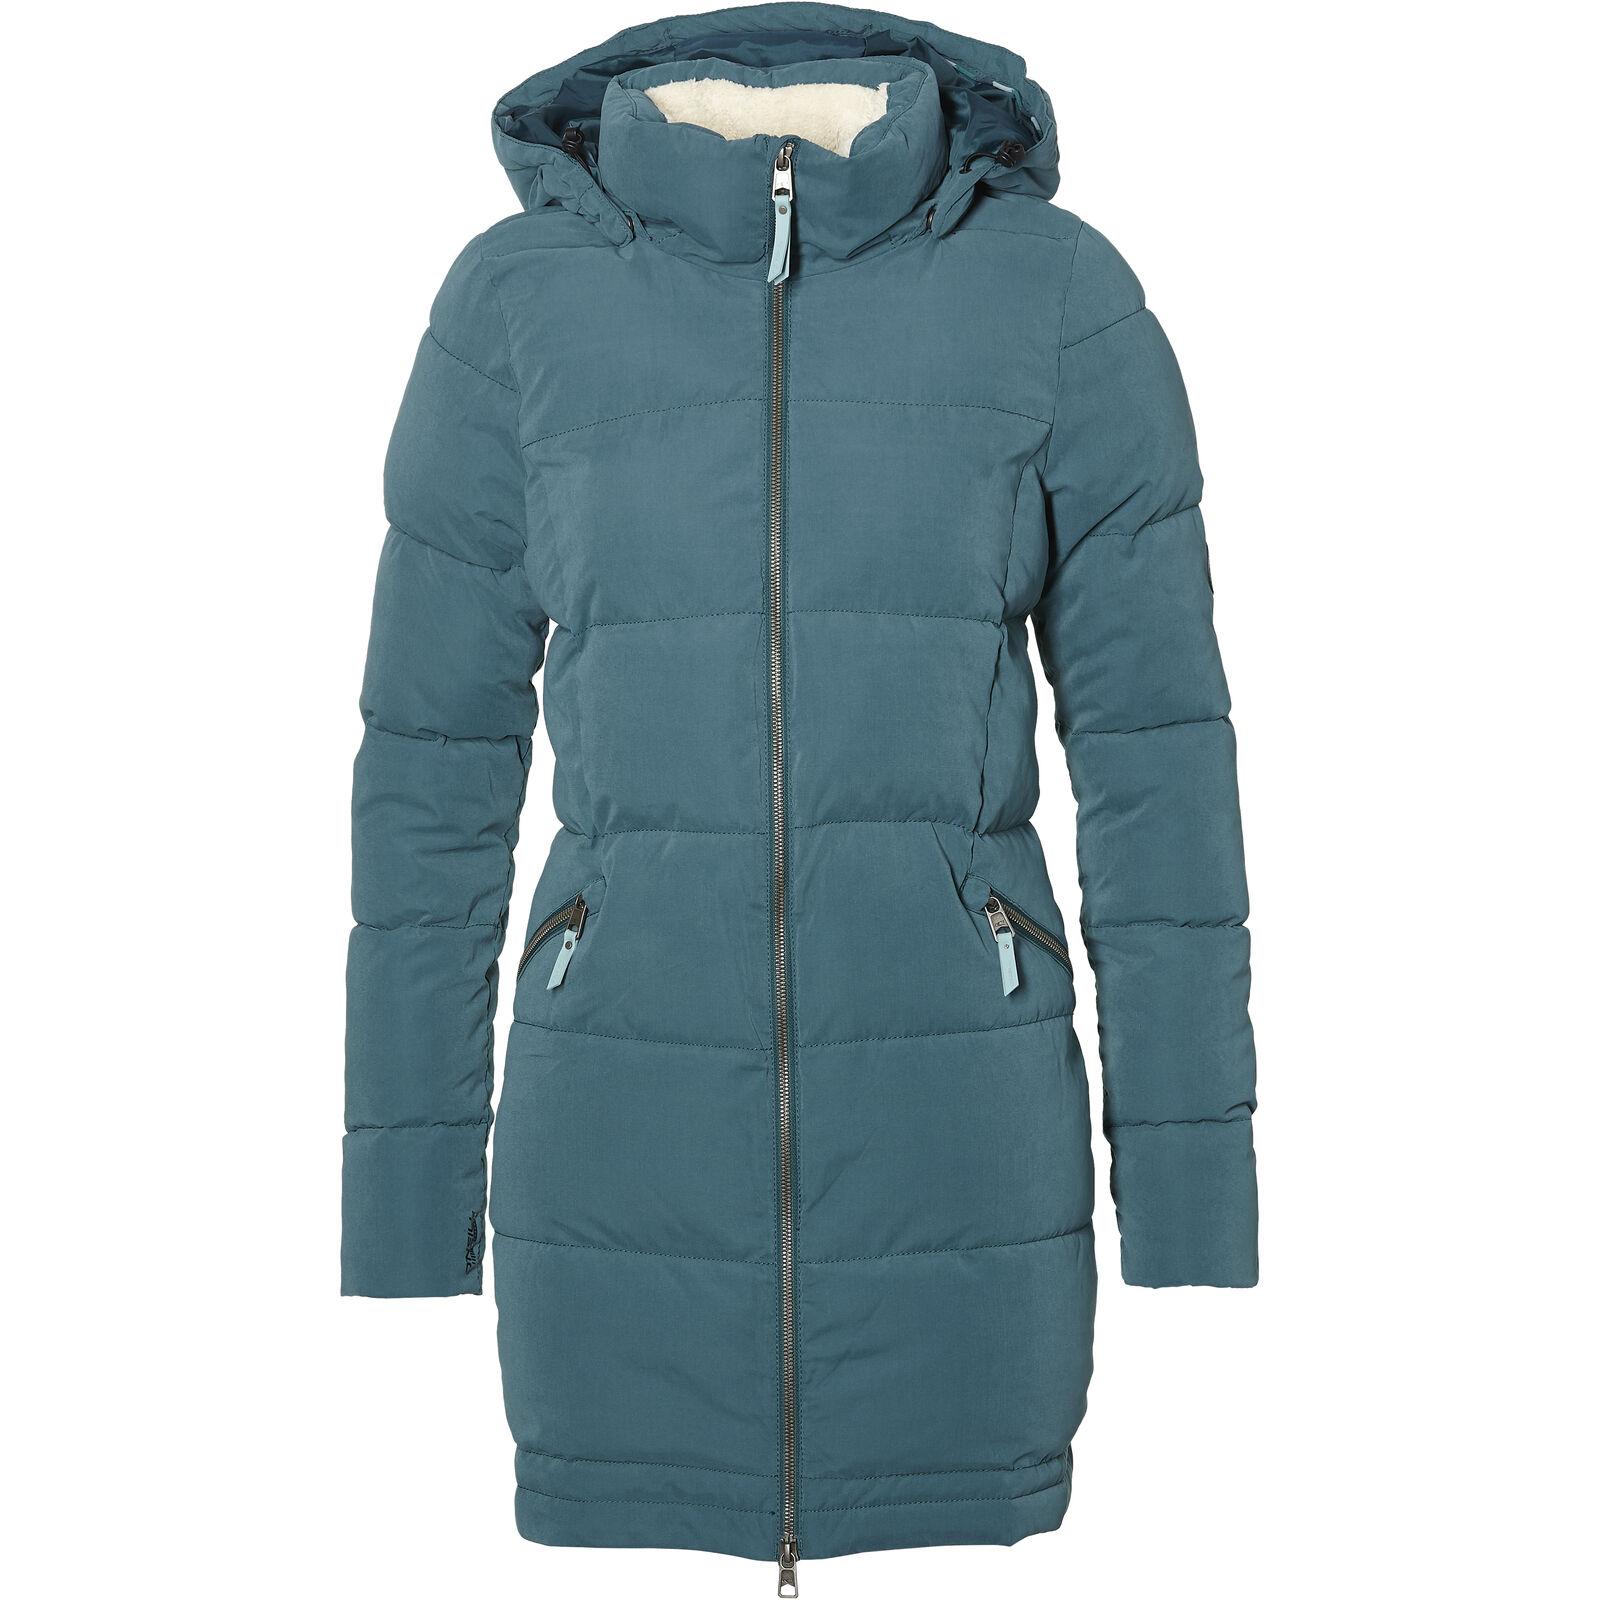 O 'Neill Funzione Giacca Giacca LW Control jacket blu resistente all'acqua